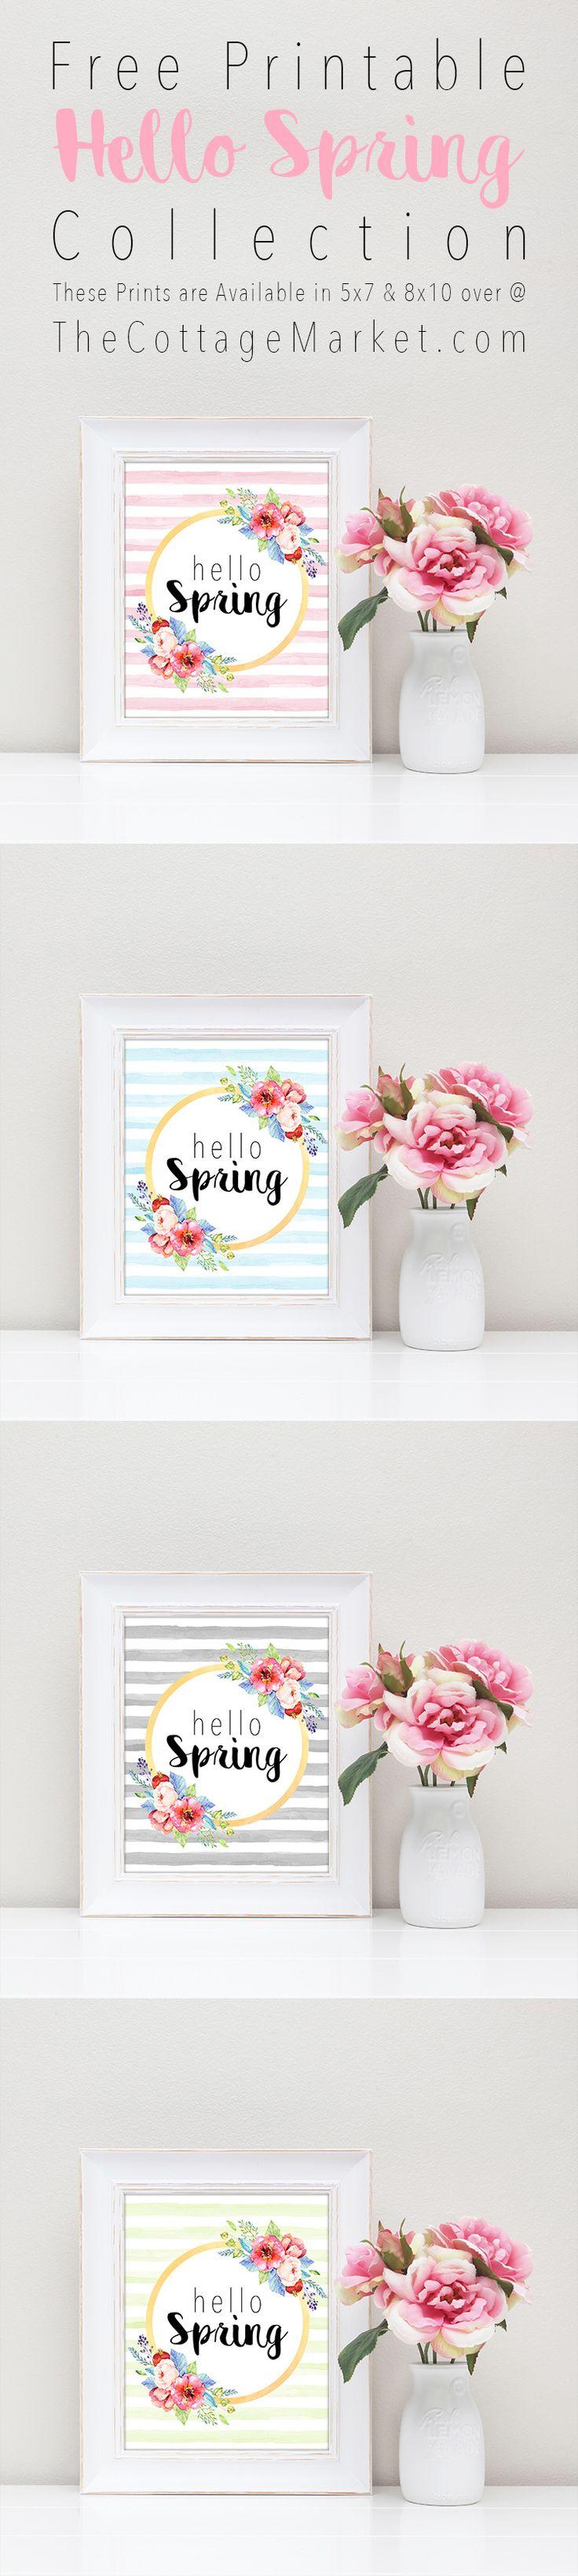 Free Printable Hello Spring Collection